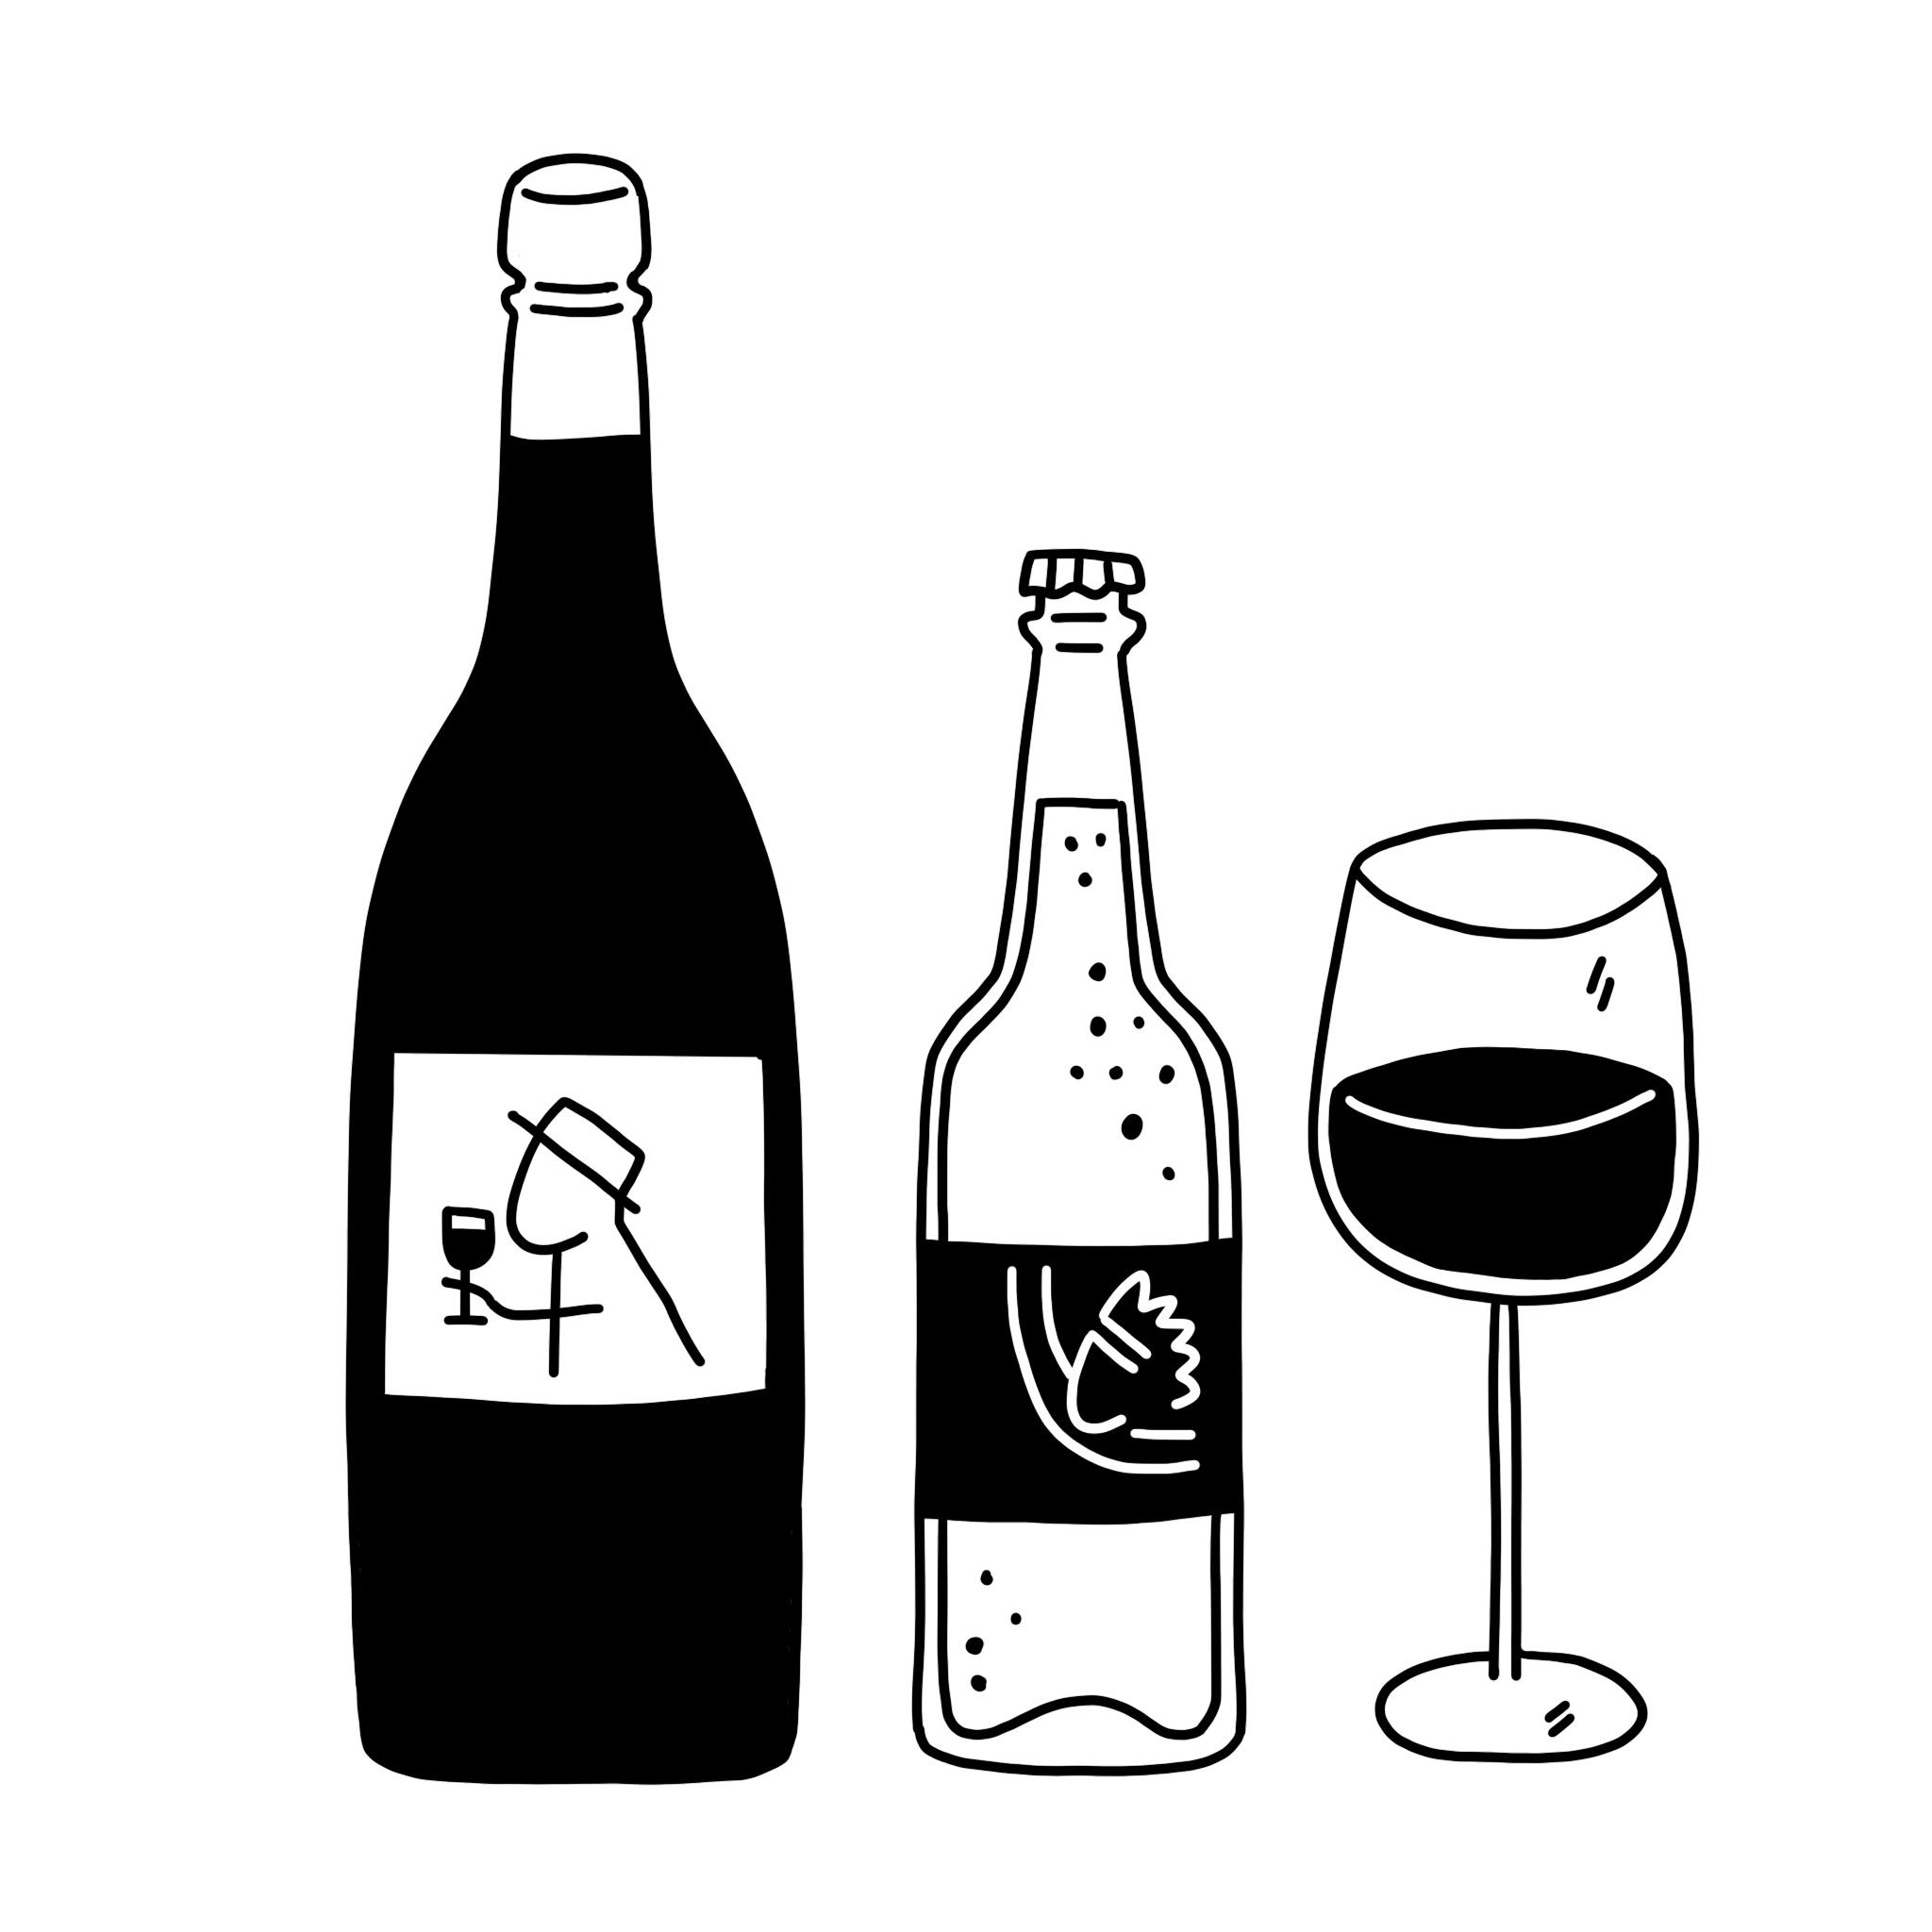 Vins, bières & spiritueux